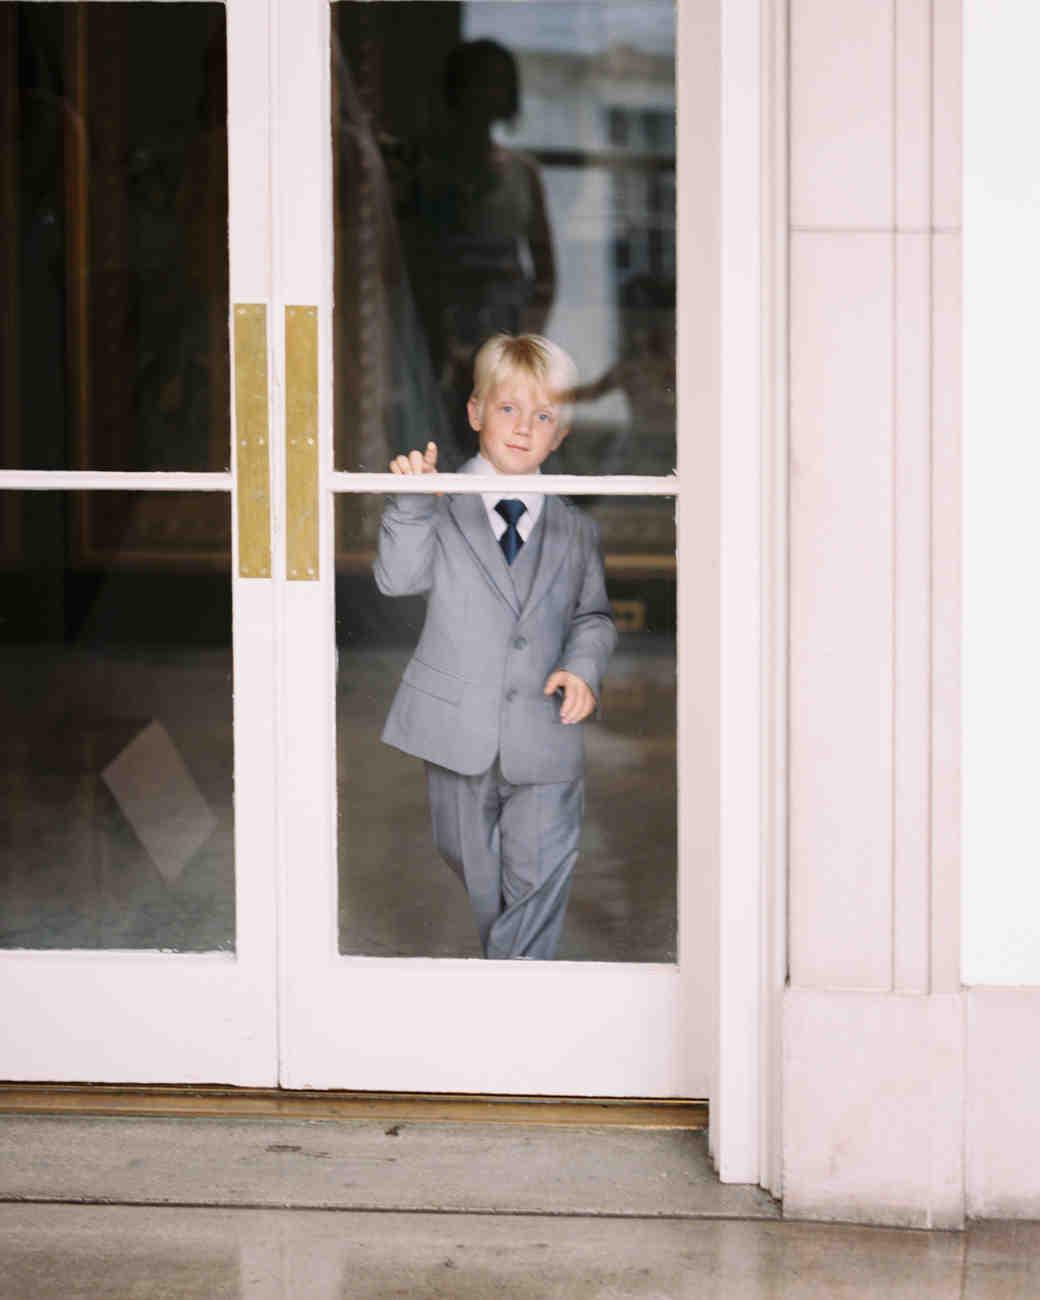 jackie-ross-wedding-boy-078-s111775-0215.jpg